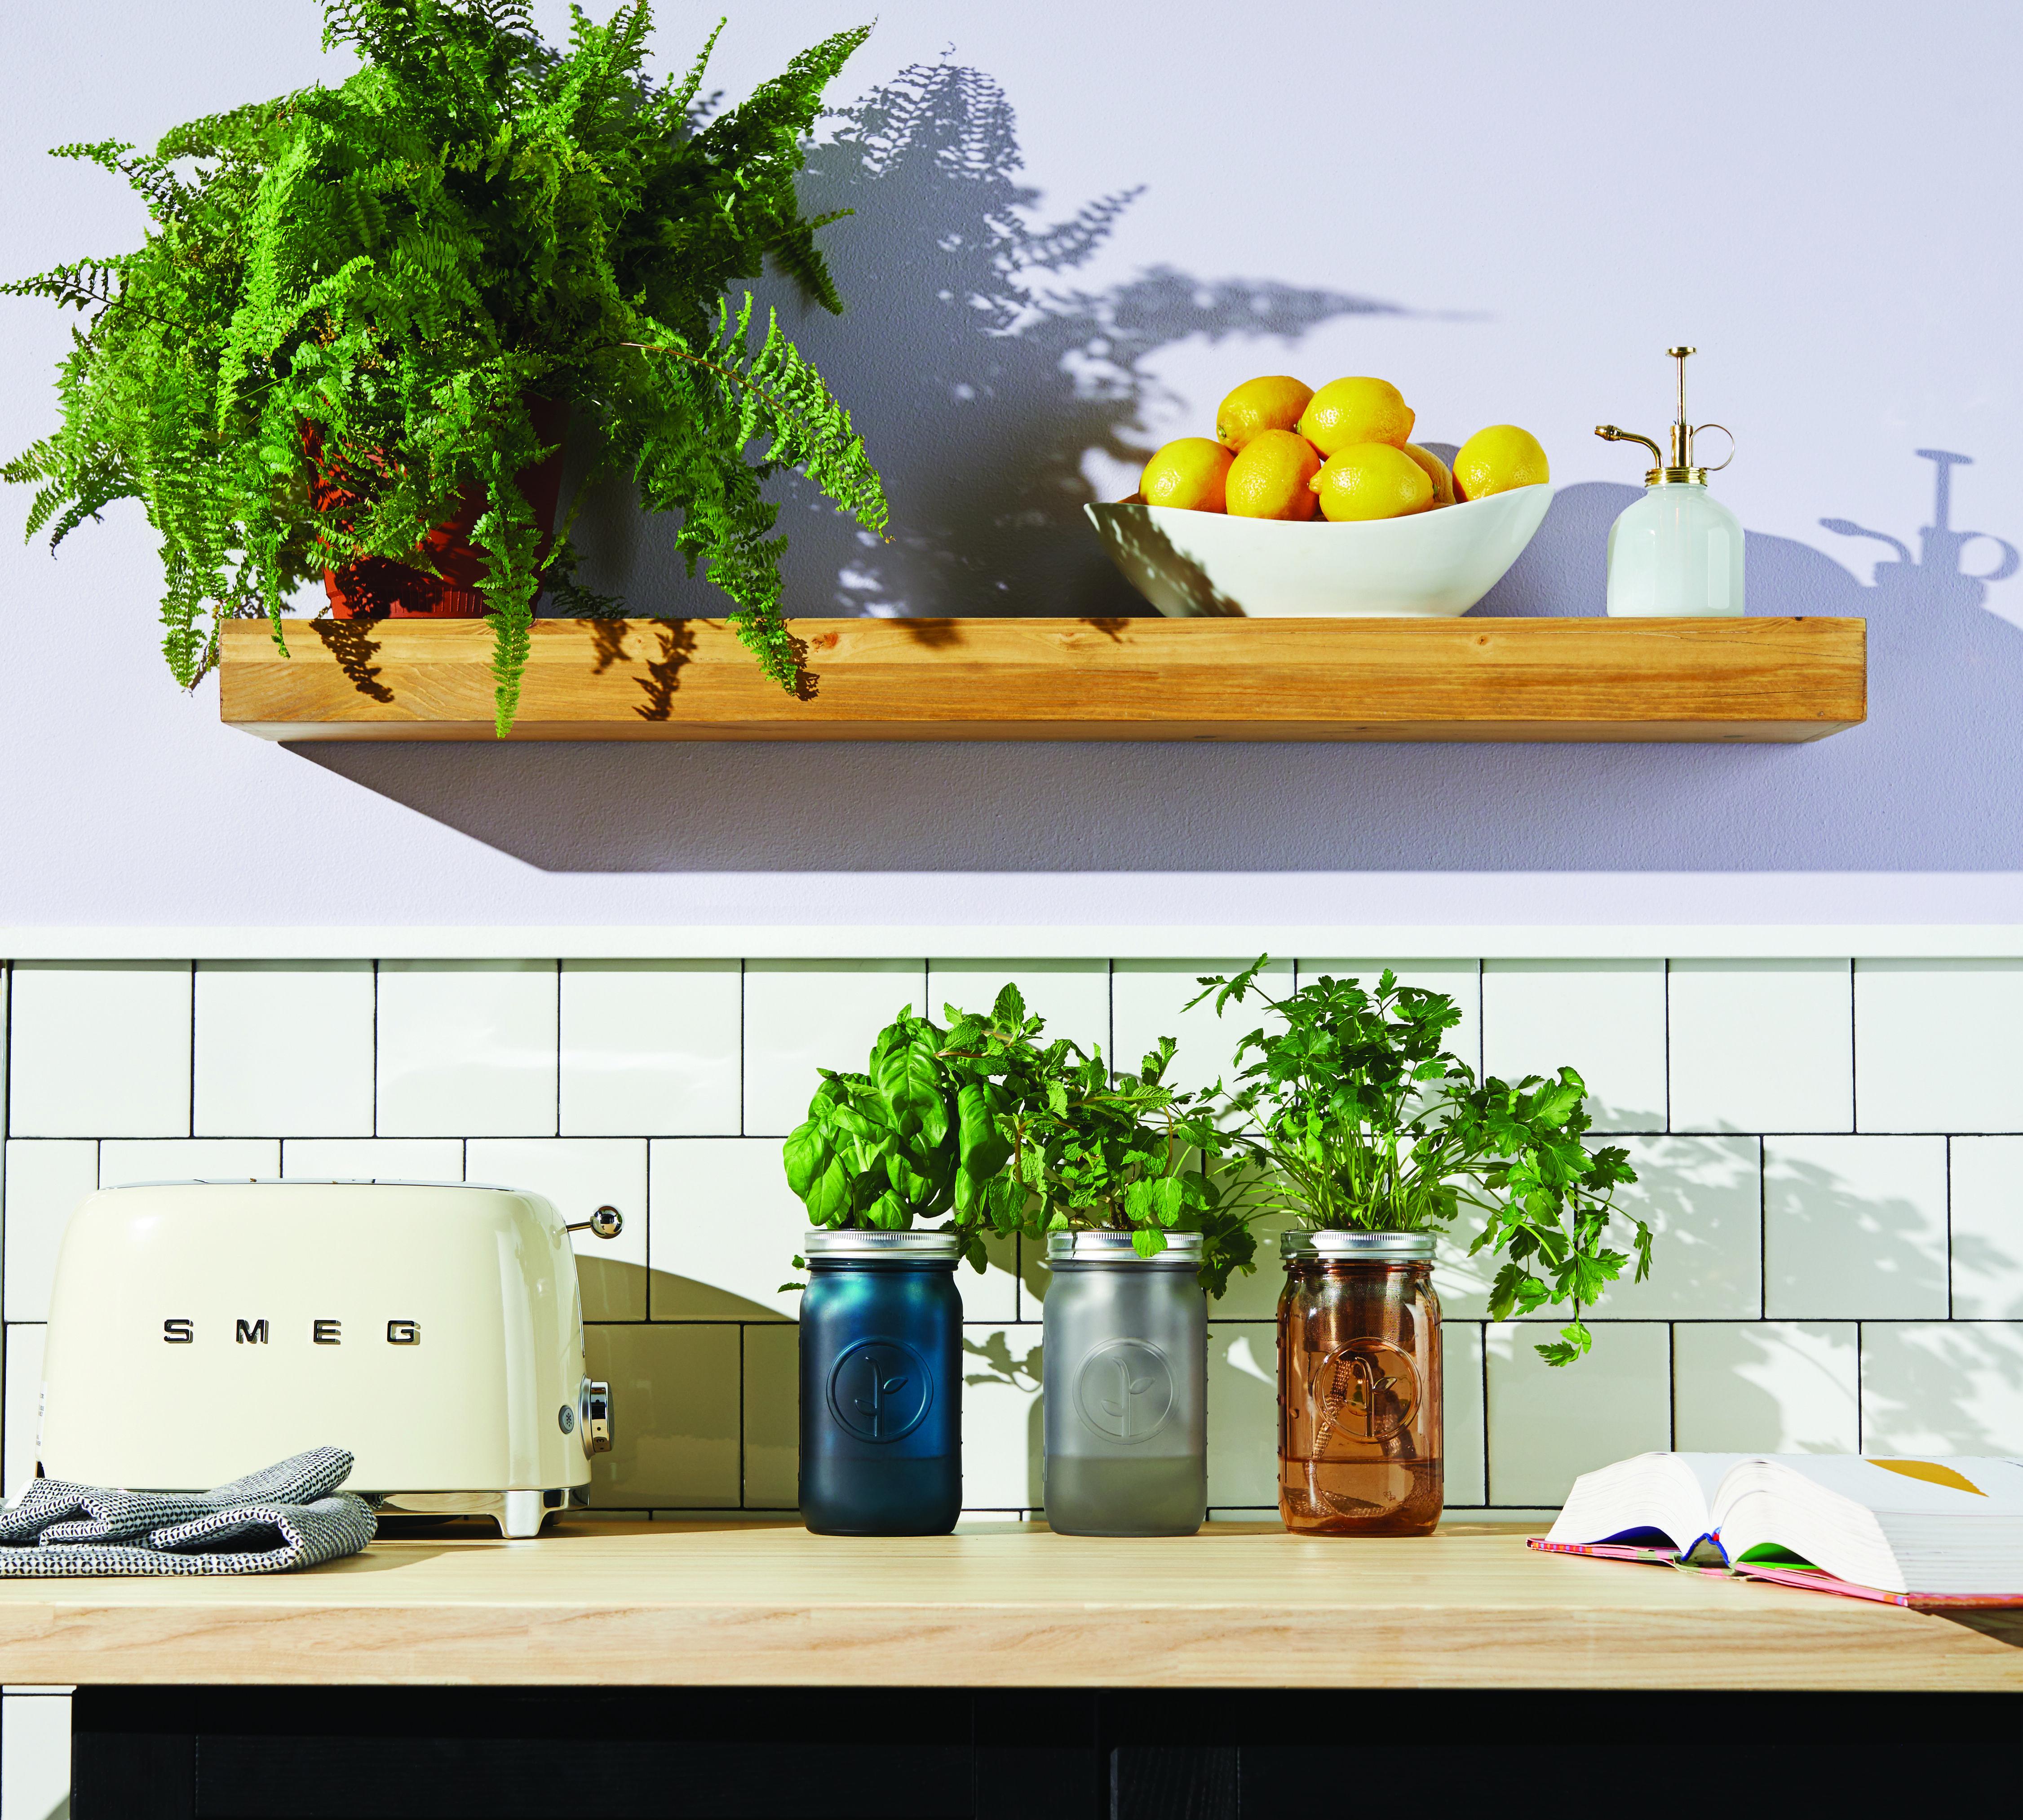 Hydroponic Herb Garden Kits Herb garden kit, Self